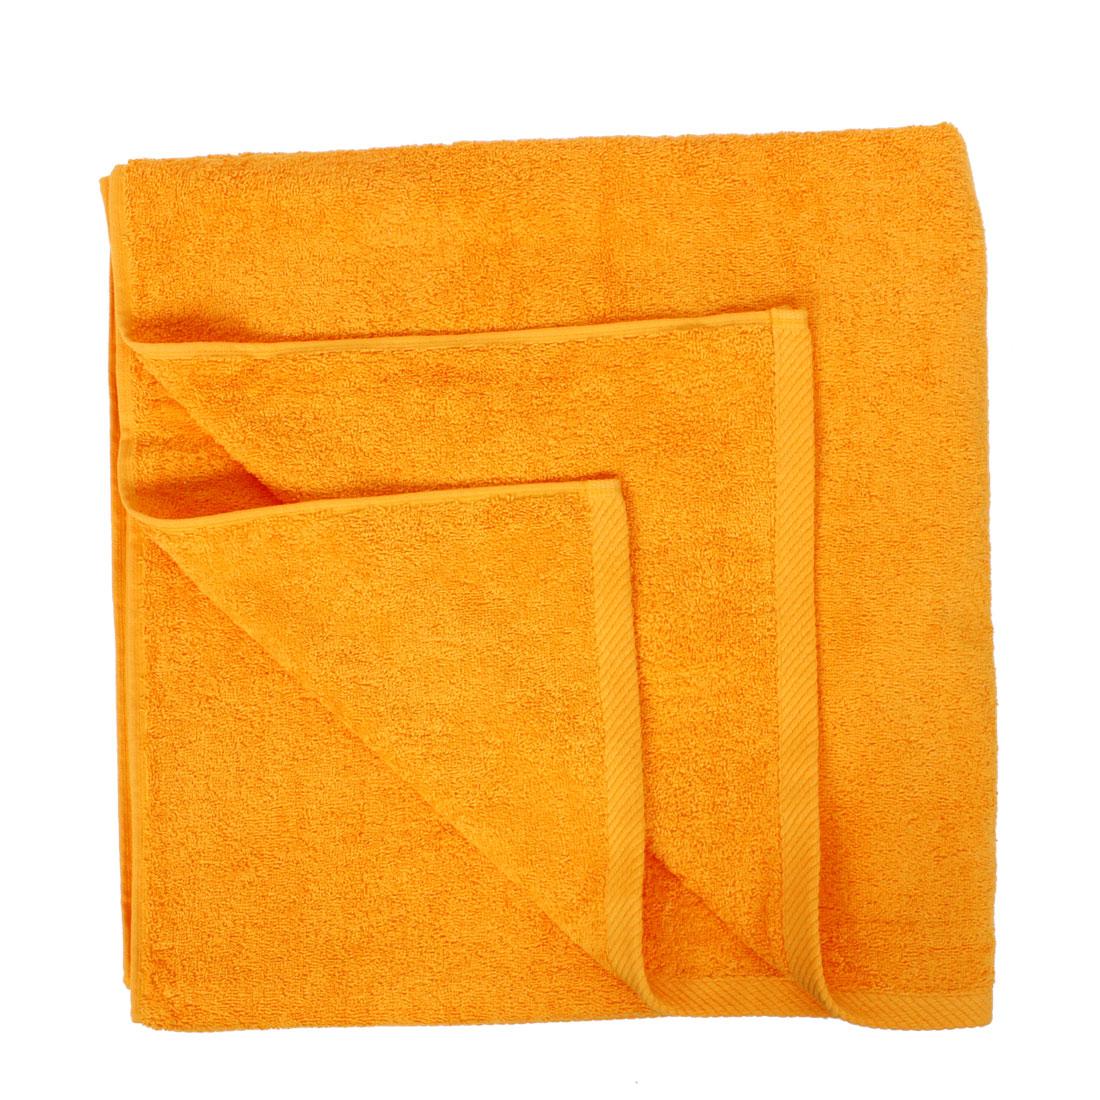 Household Bathroom Gym Beach Shower Bath Towel Sheet Orange 160 x 80cm